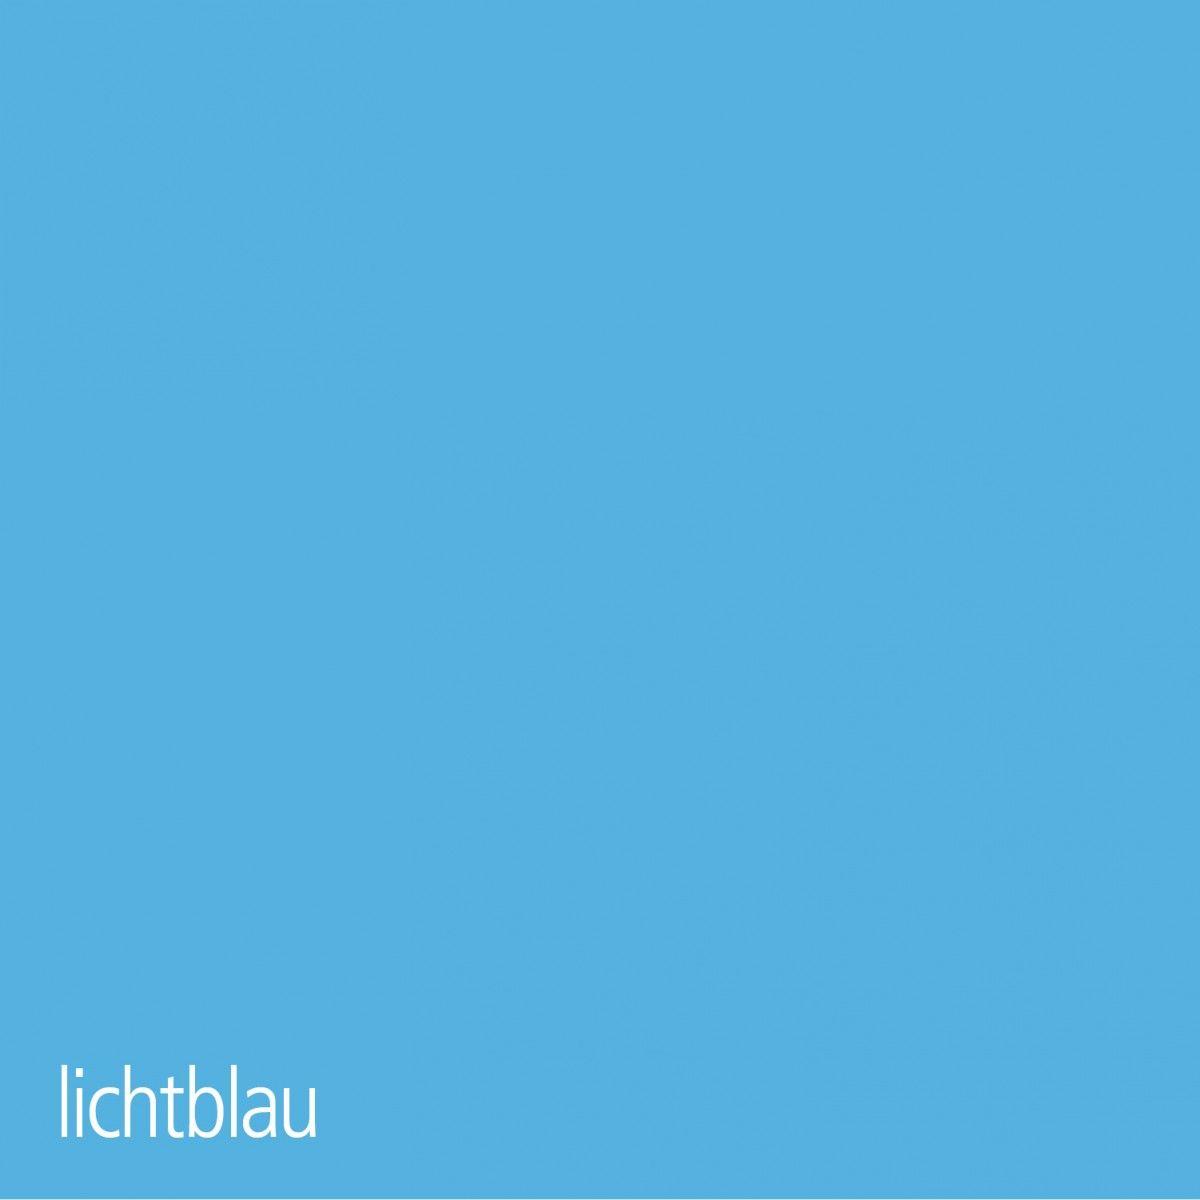 133019-Lichtblau_Detail